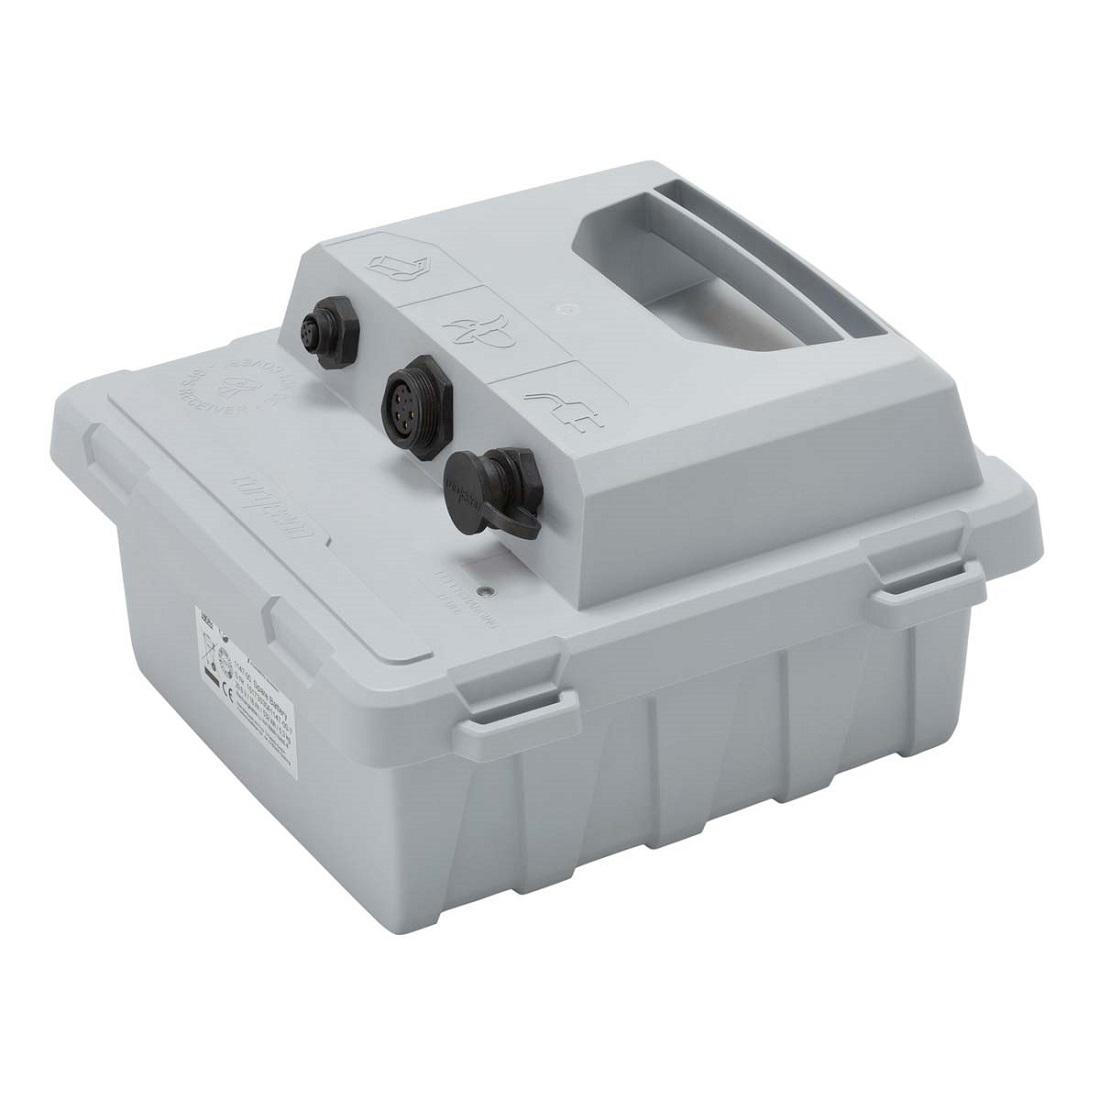 Torqeedo Ultralight 403 Spare Battery - 915 Wh